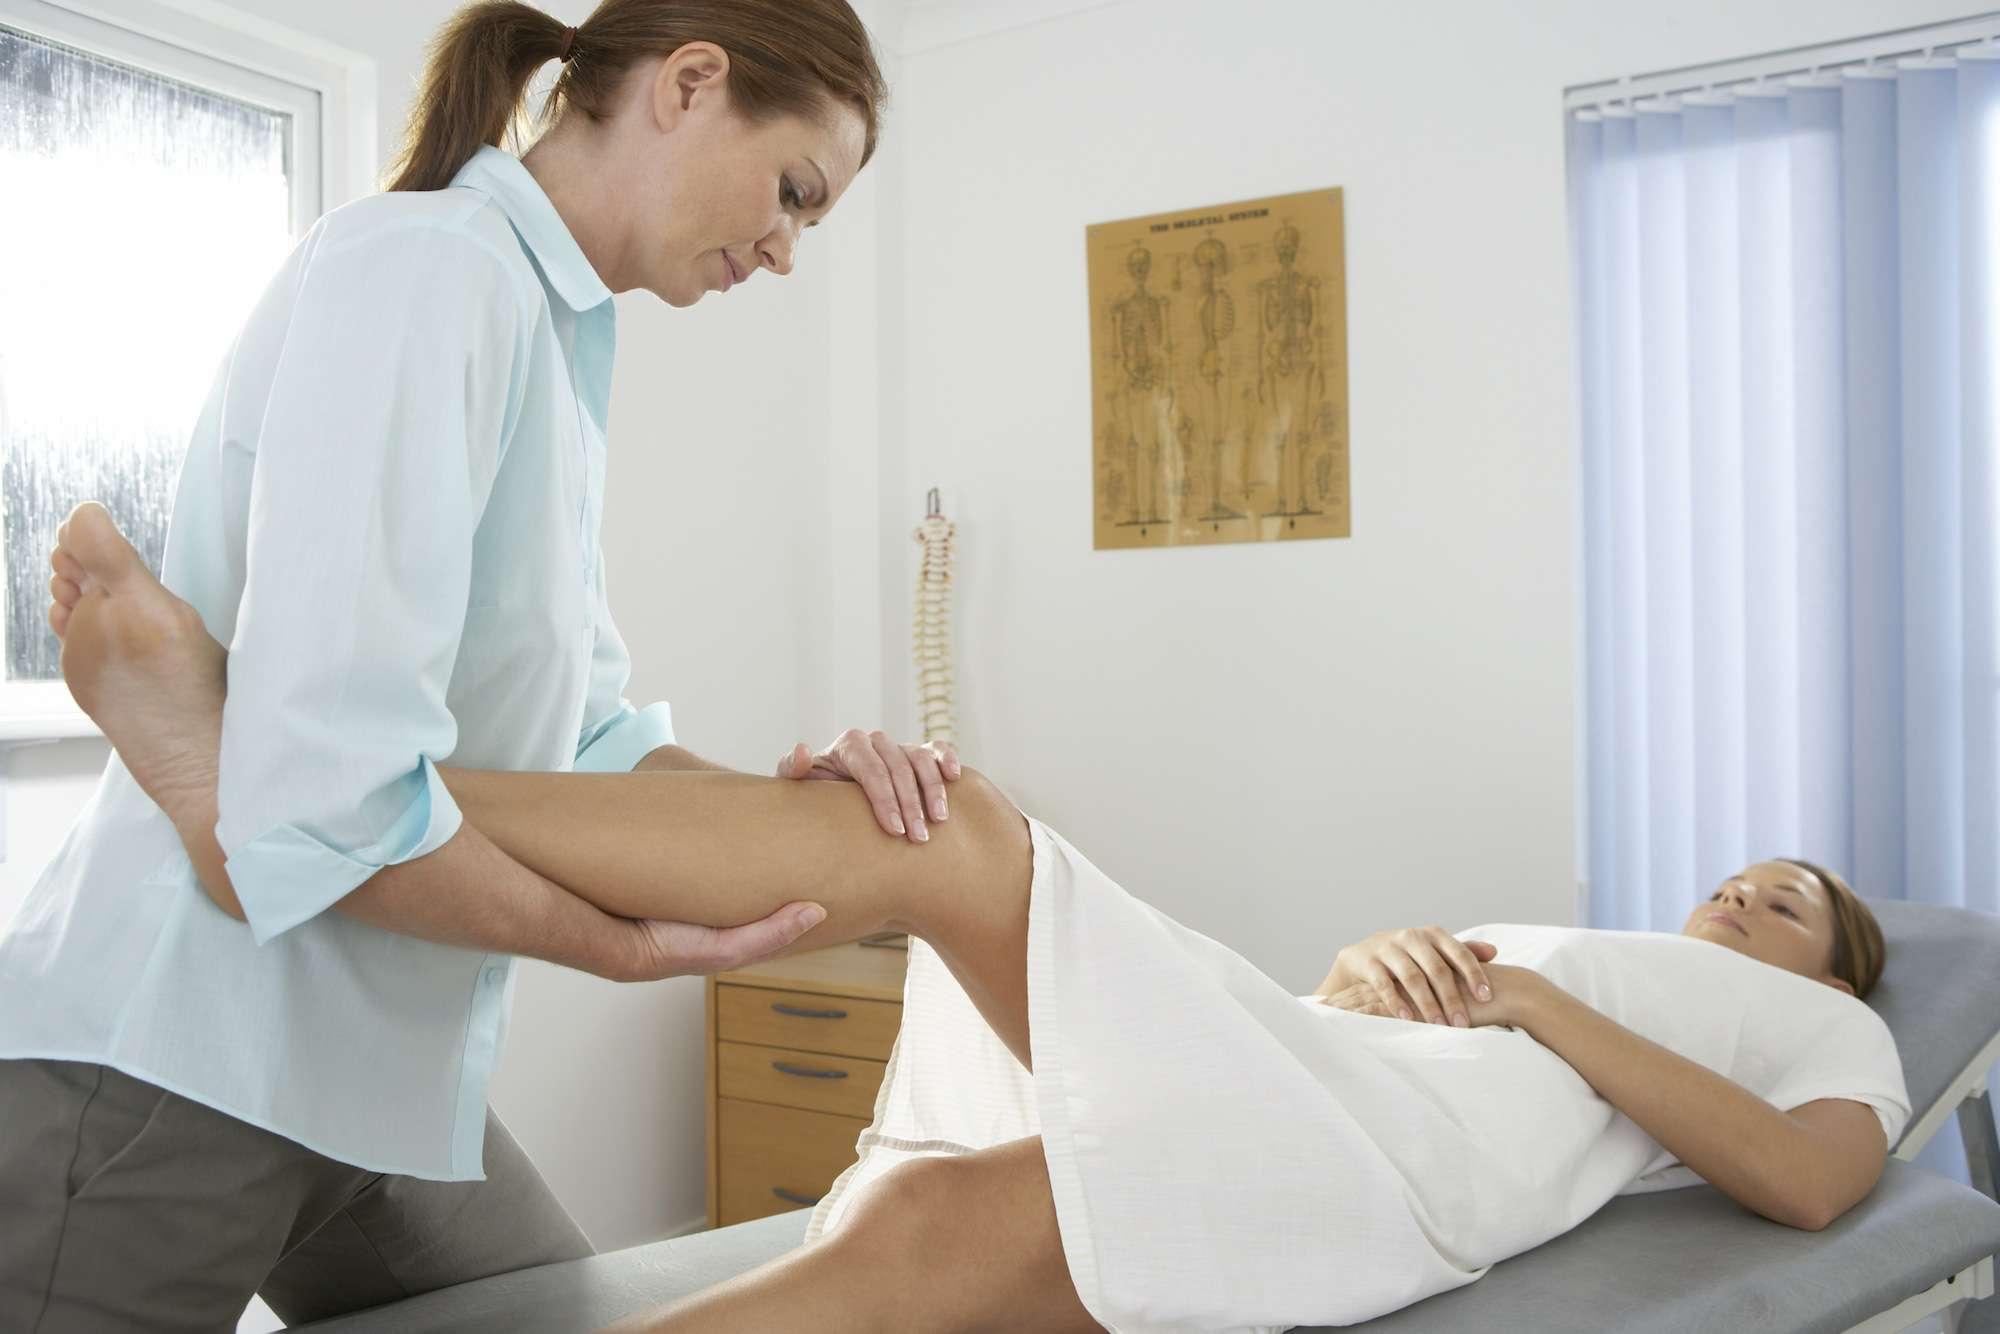 Chiropractic examination of a patient's knee